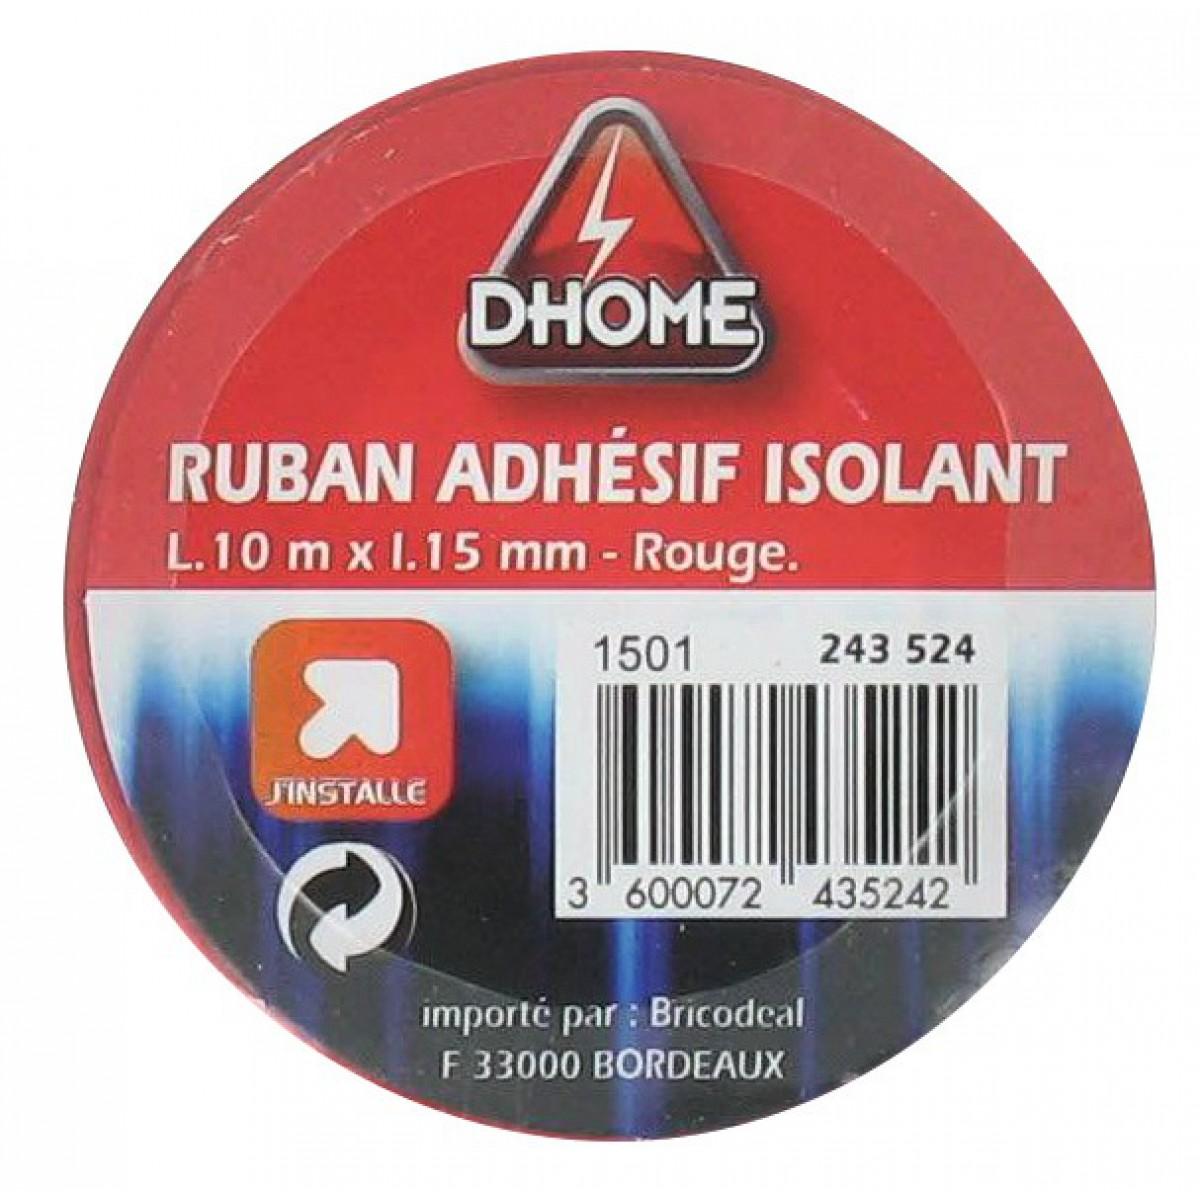 Ruban adhésif isolant Dhome - Rouge